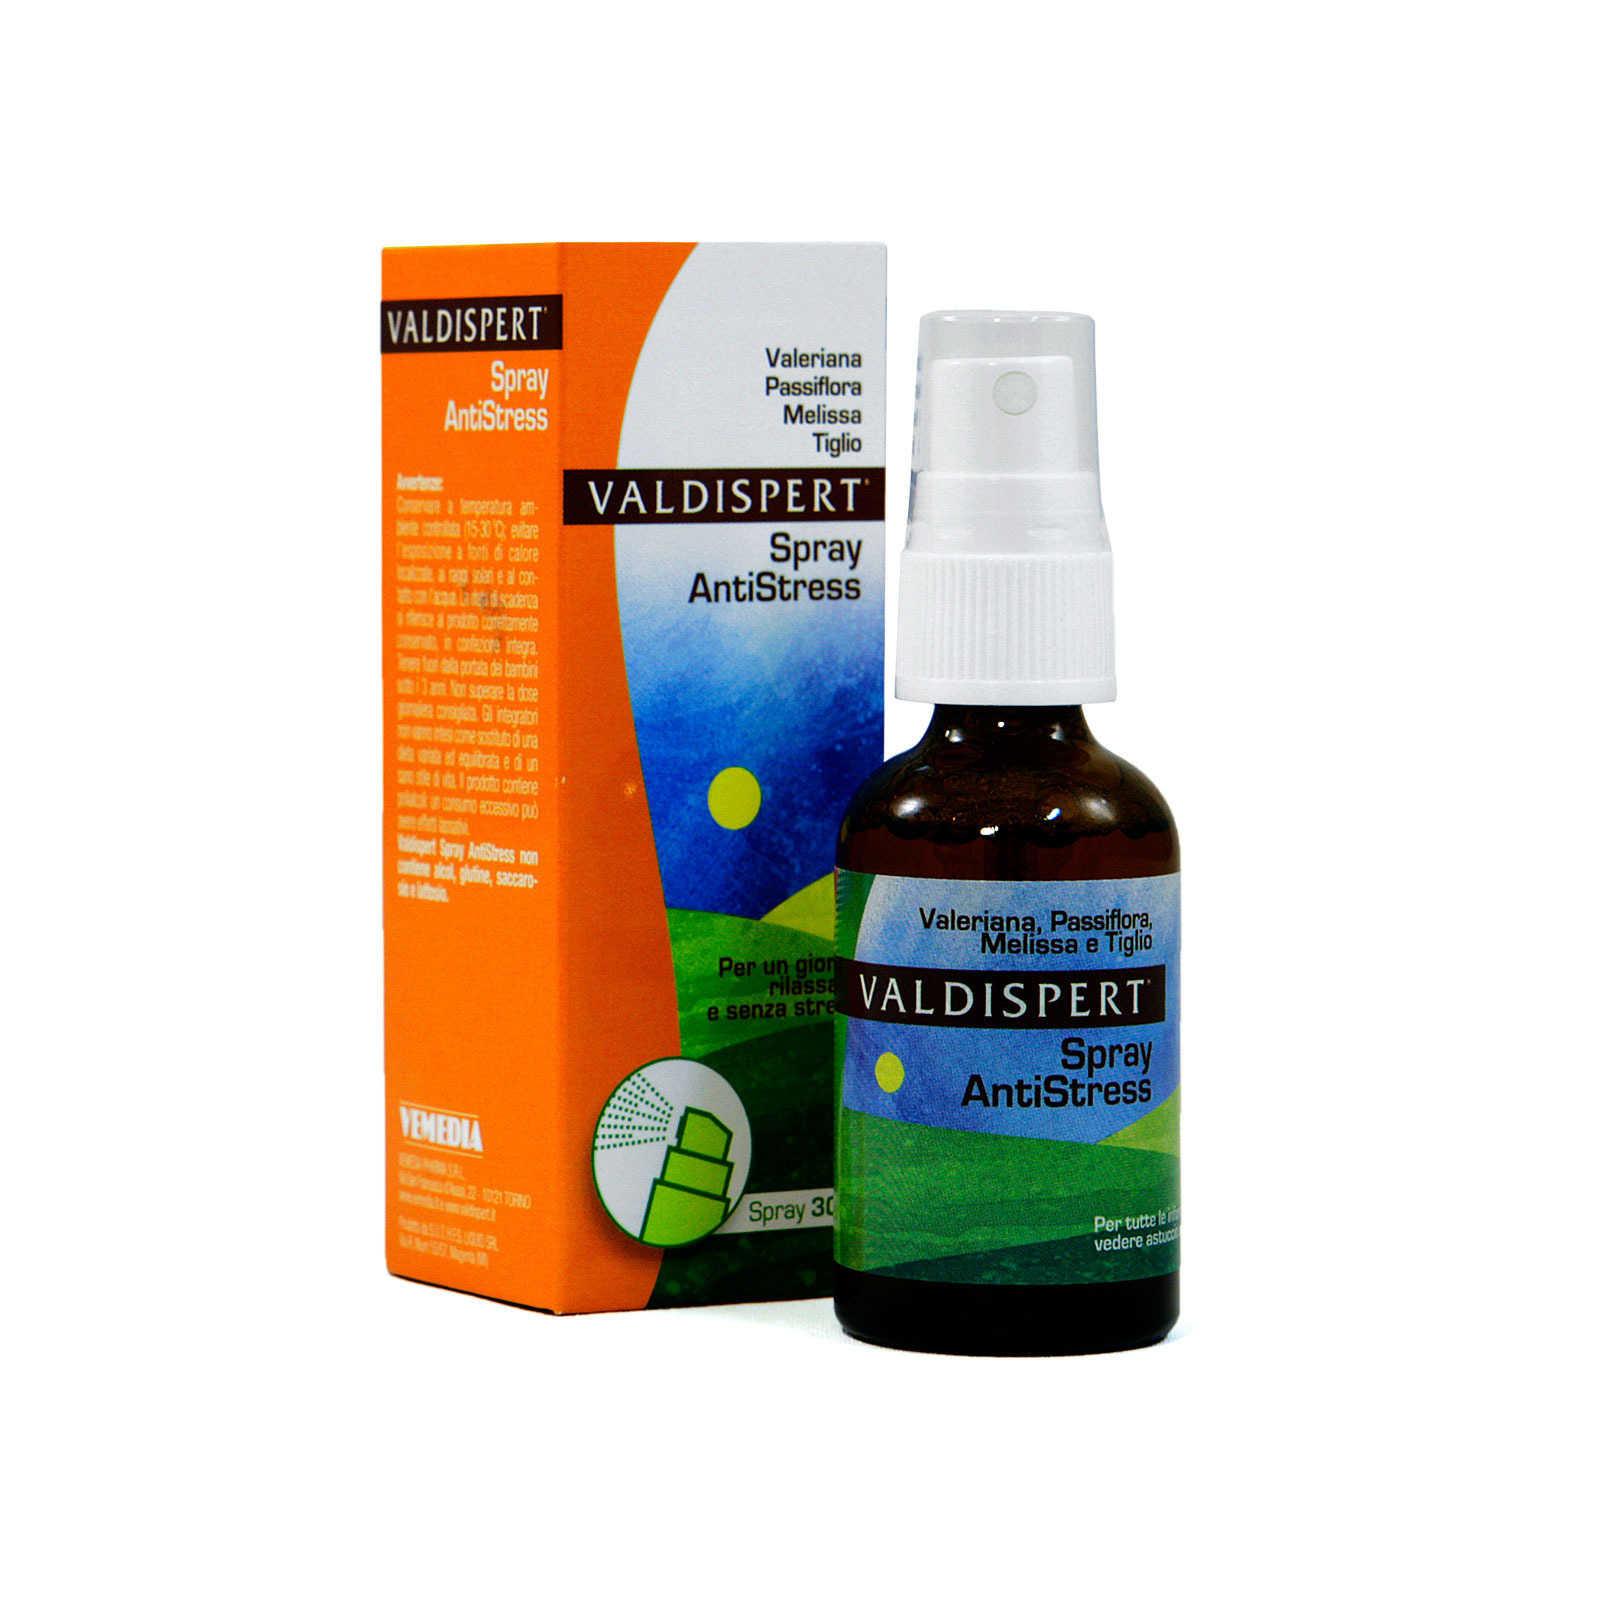 Valdispert - Integratore alimentare - Spray Antistress